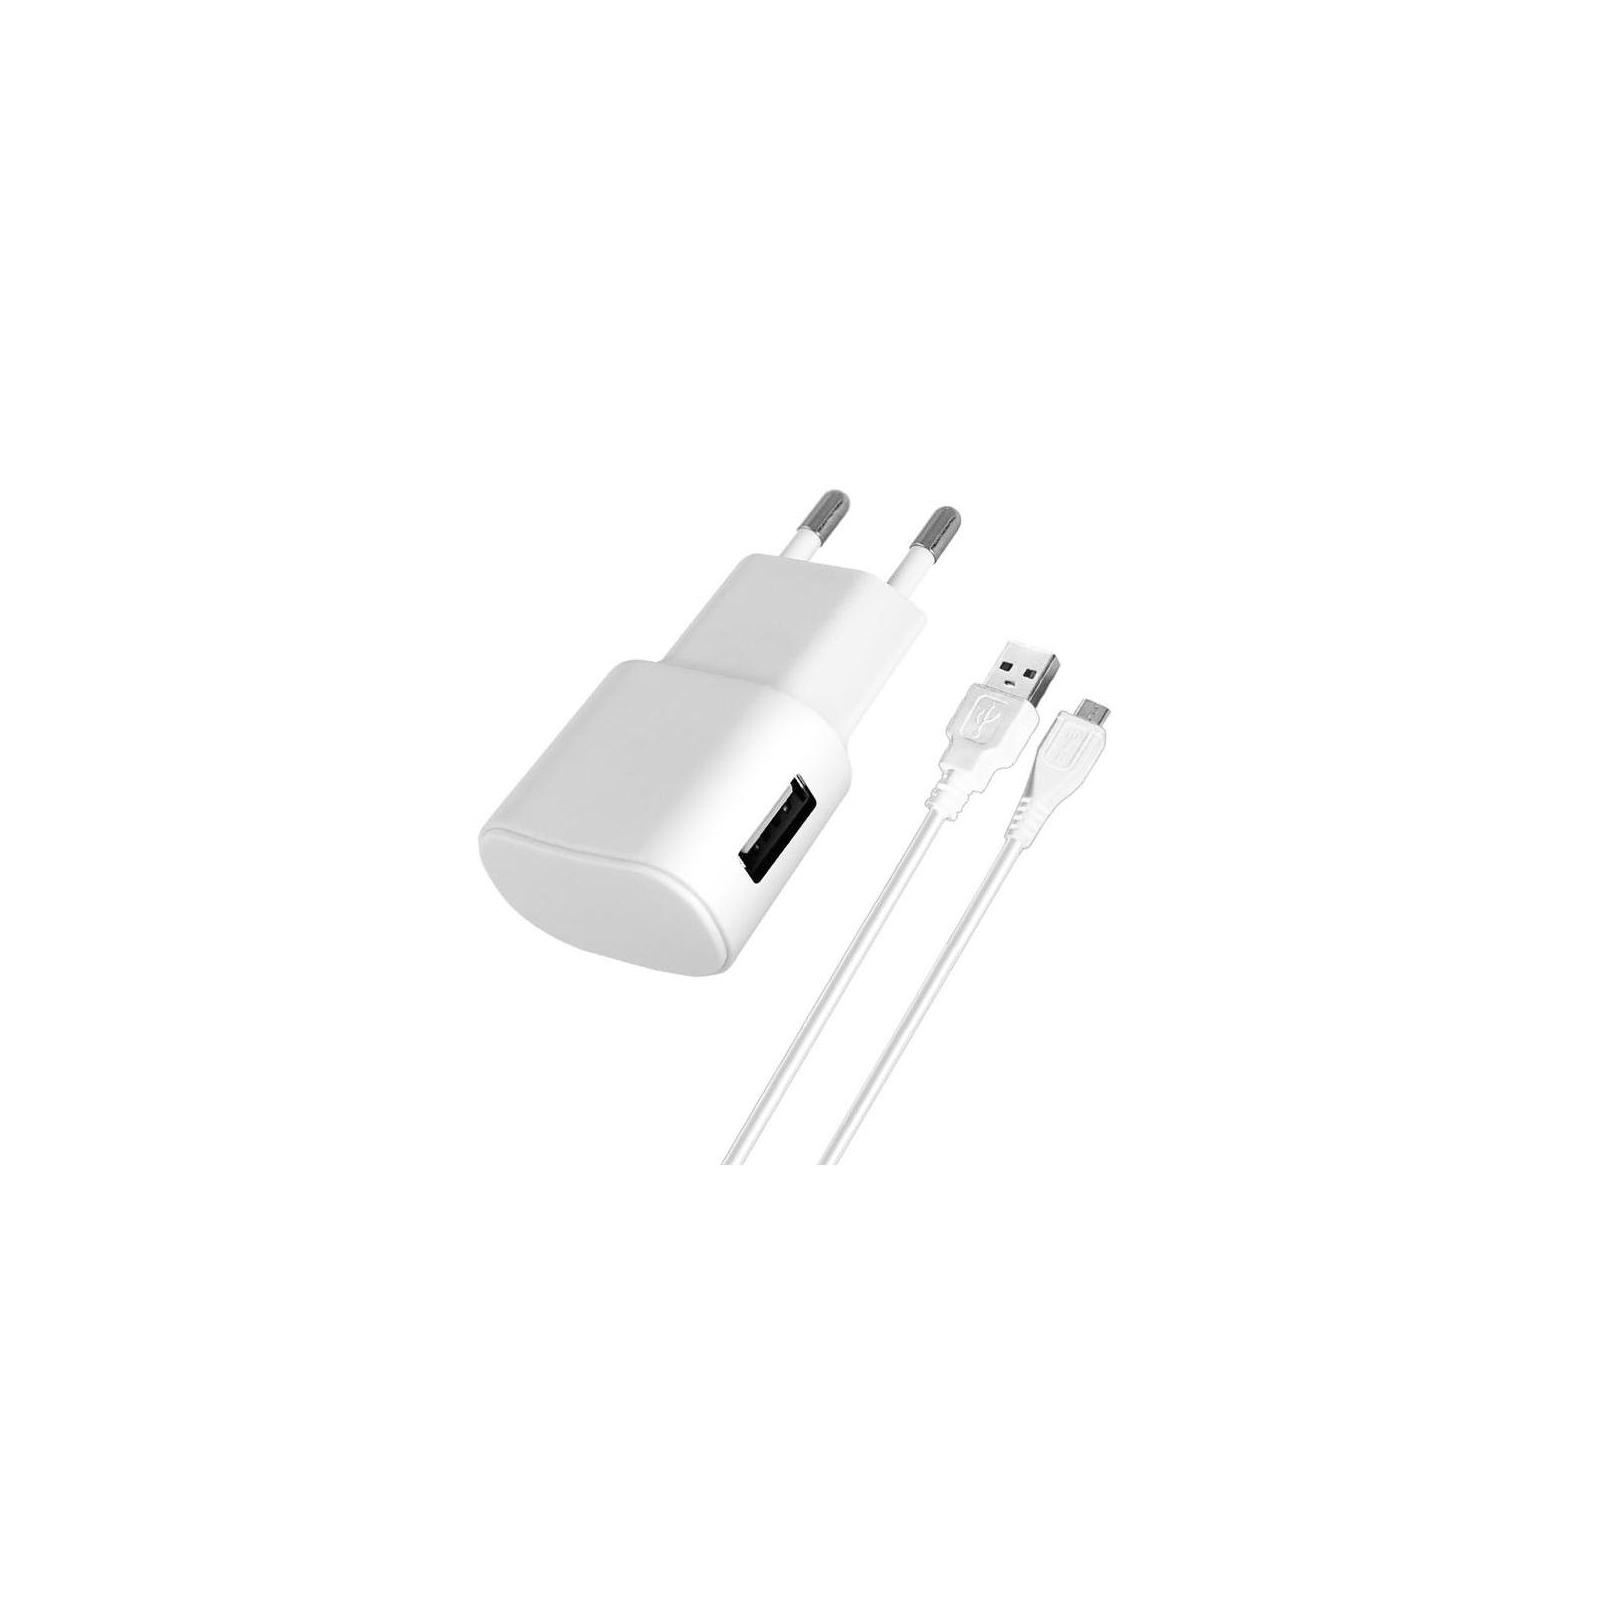 Зарядное устройство Florence USB, 1.0A + cable microUSB white (FW-1U010W-M)